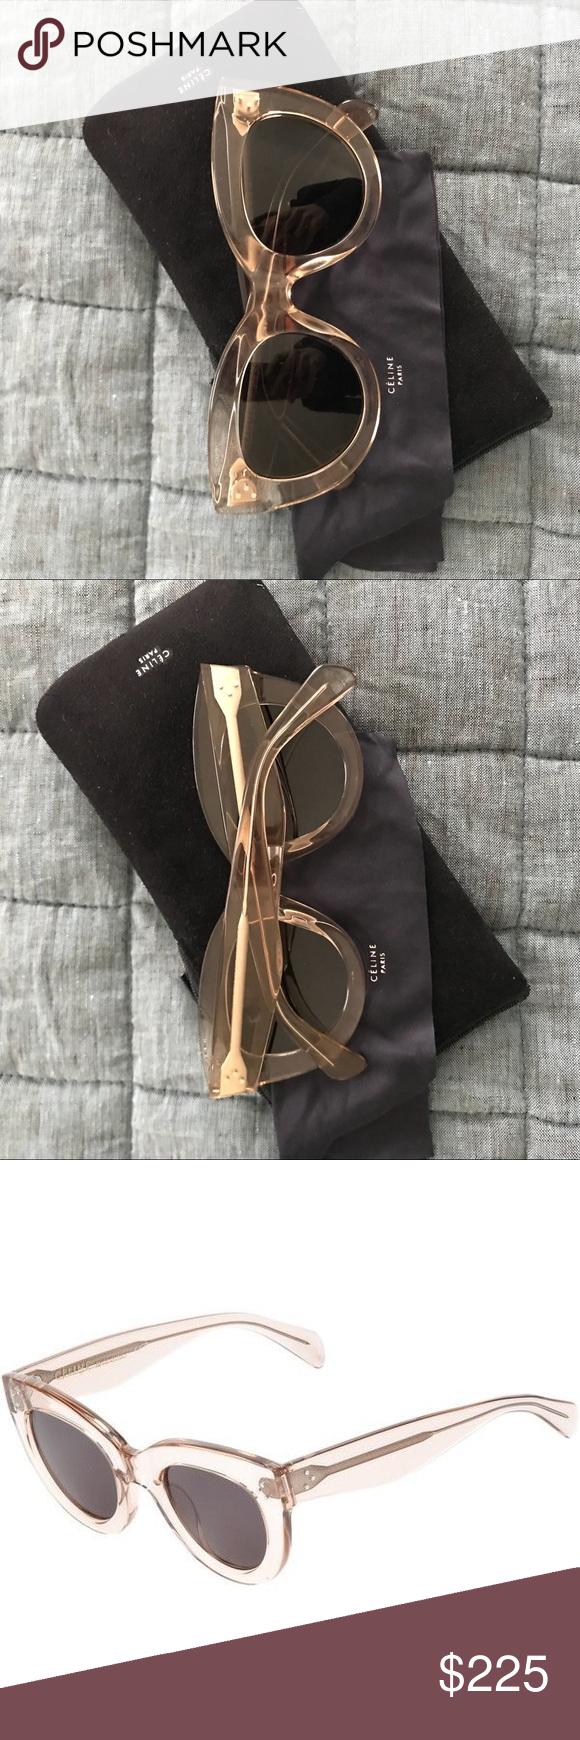 dfa10368a14 Spotted while shopping on Poshmark  Celine Cat-Eye Sunglasses!  poshmark   fashion  shopping  style  Celine  Accessories